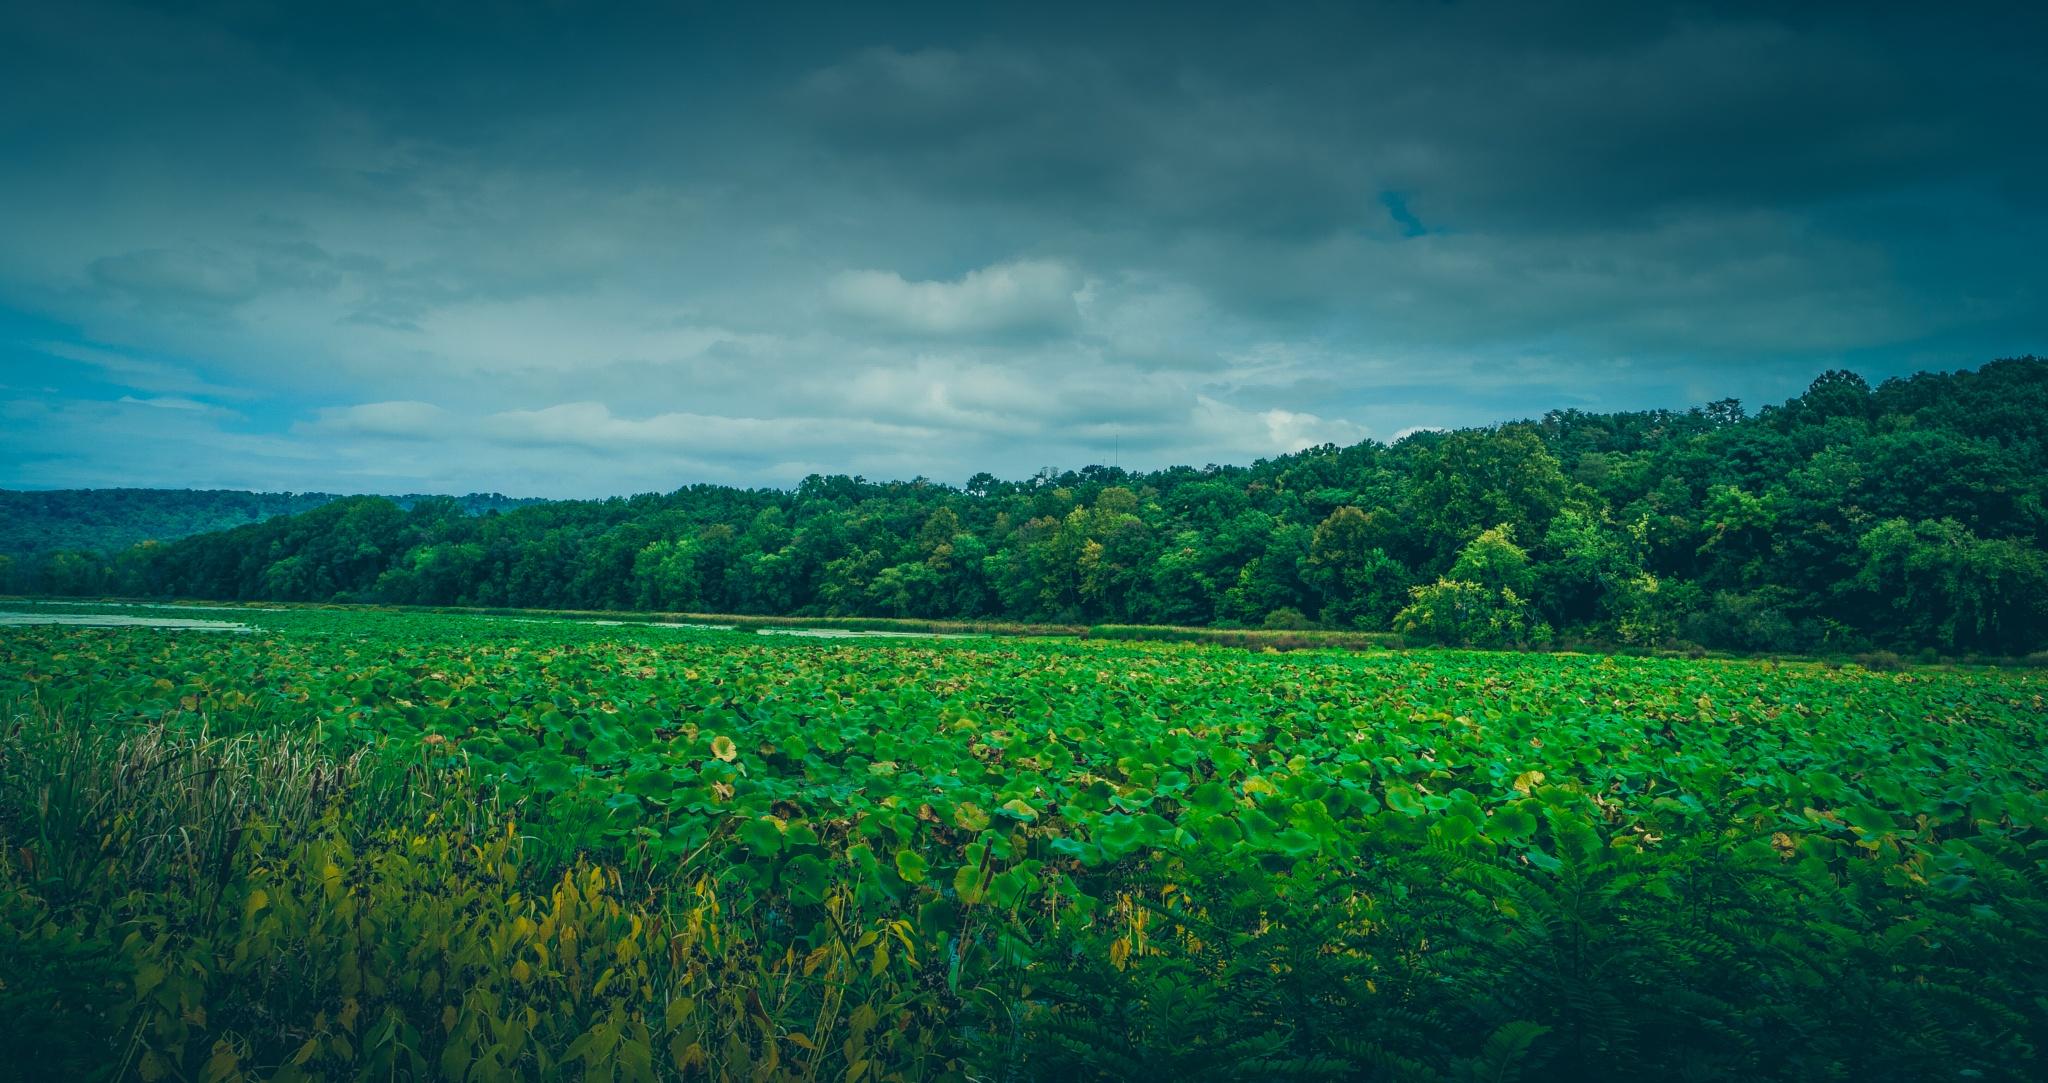 Wildwood Lake by Mio Romanic